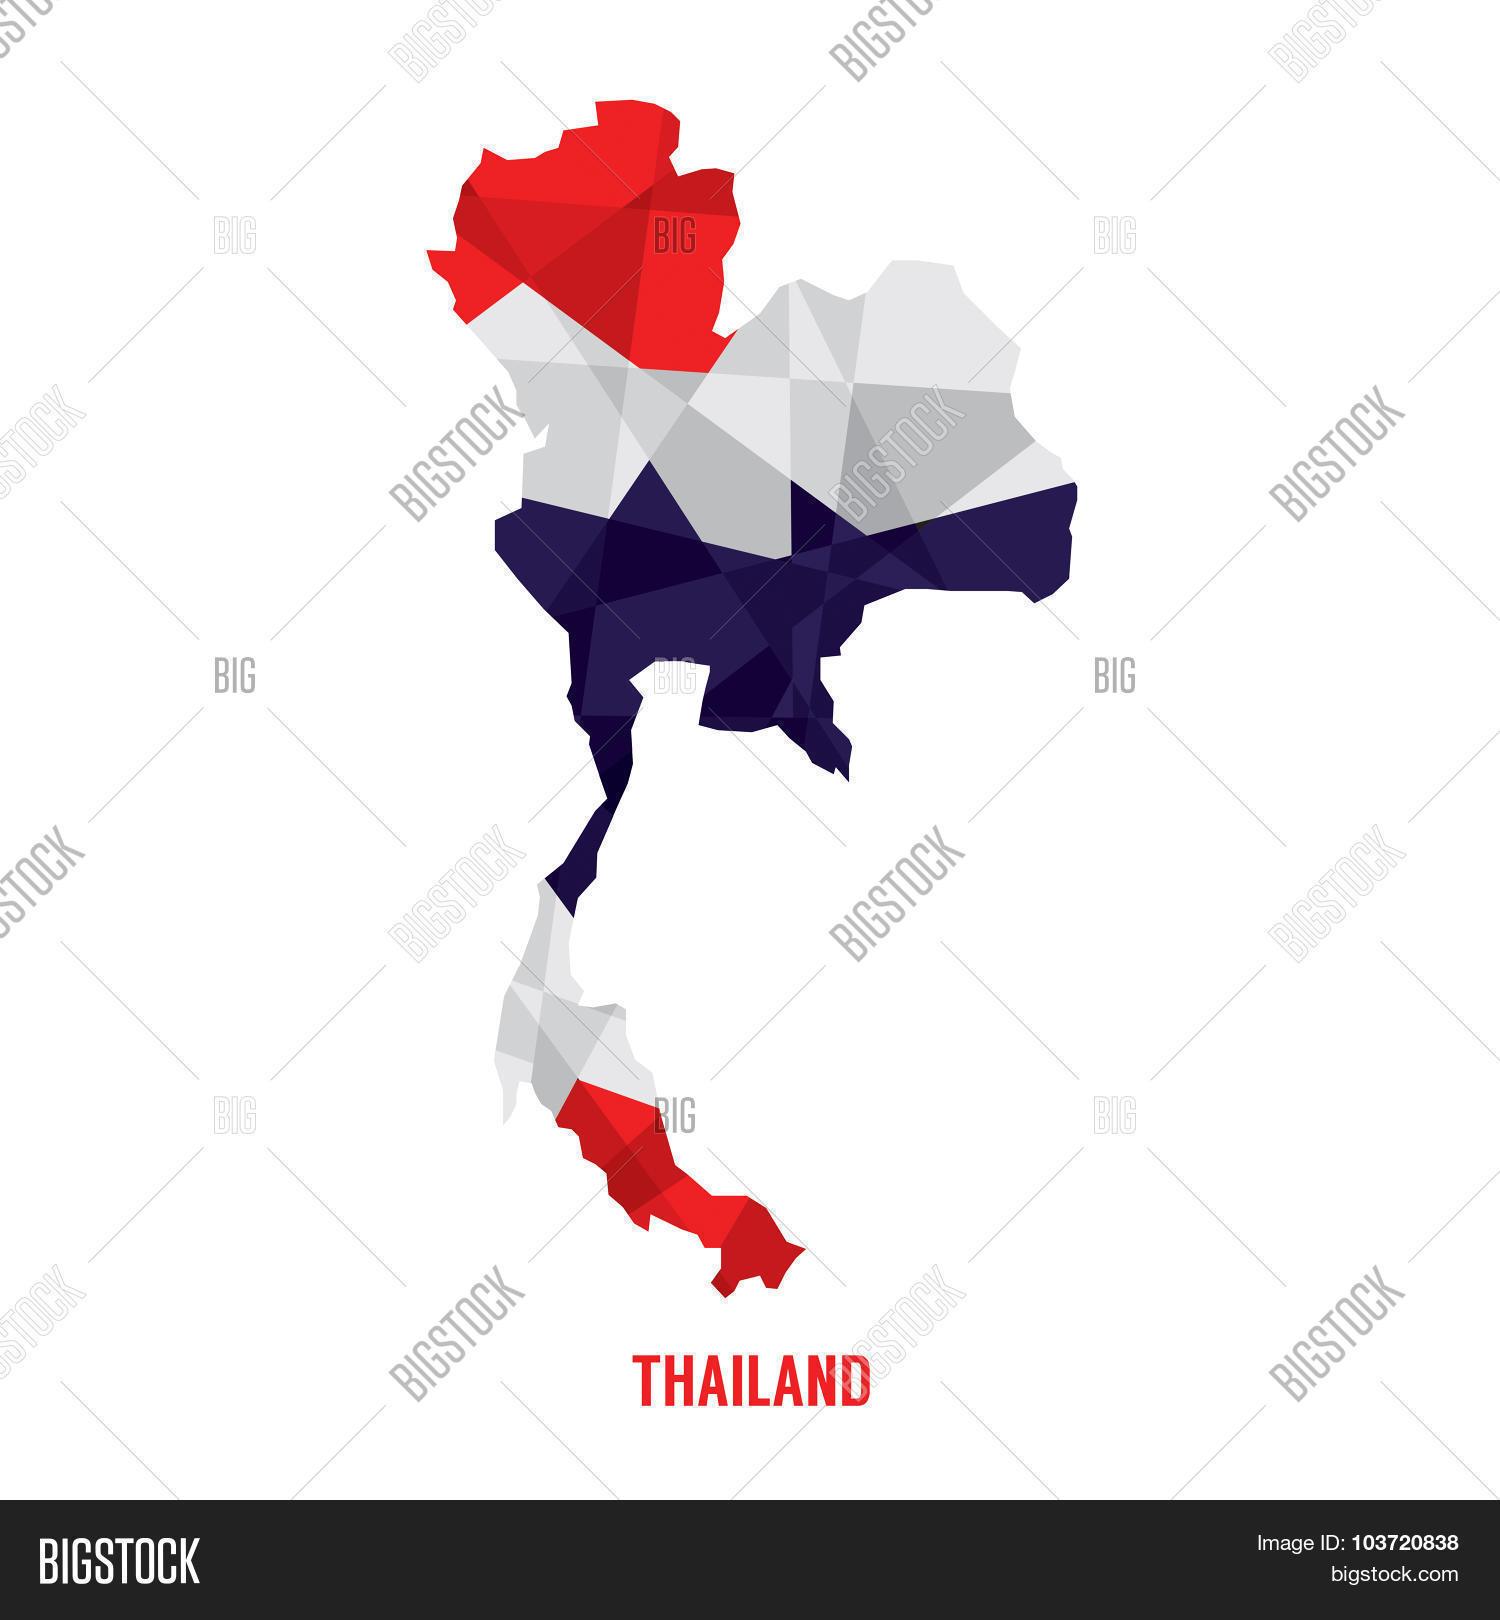 Map Thailand Vector Vector & Photo (Free Trial) | Bigstock